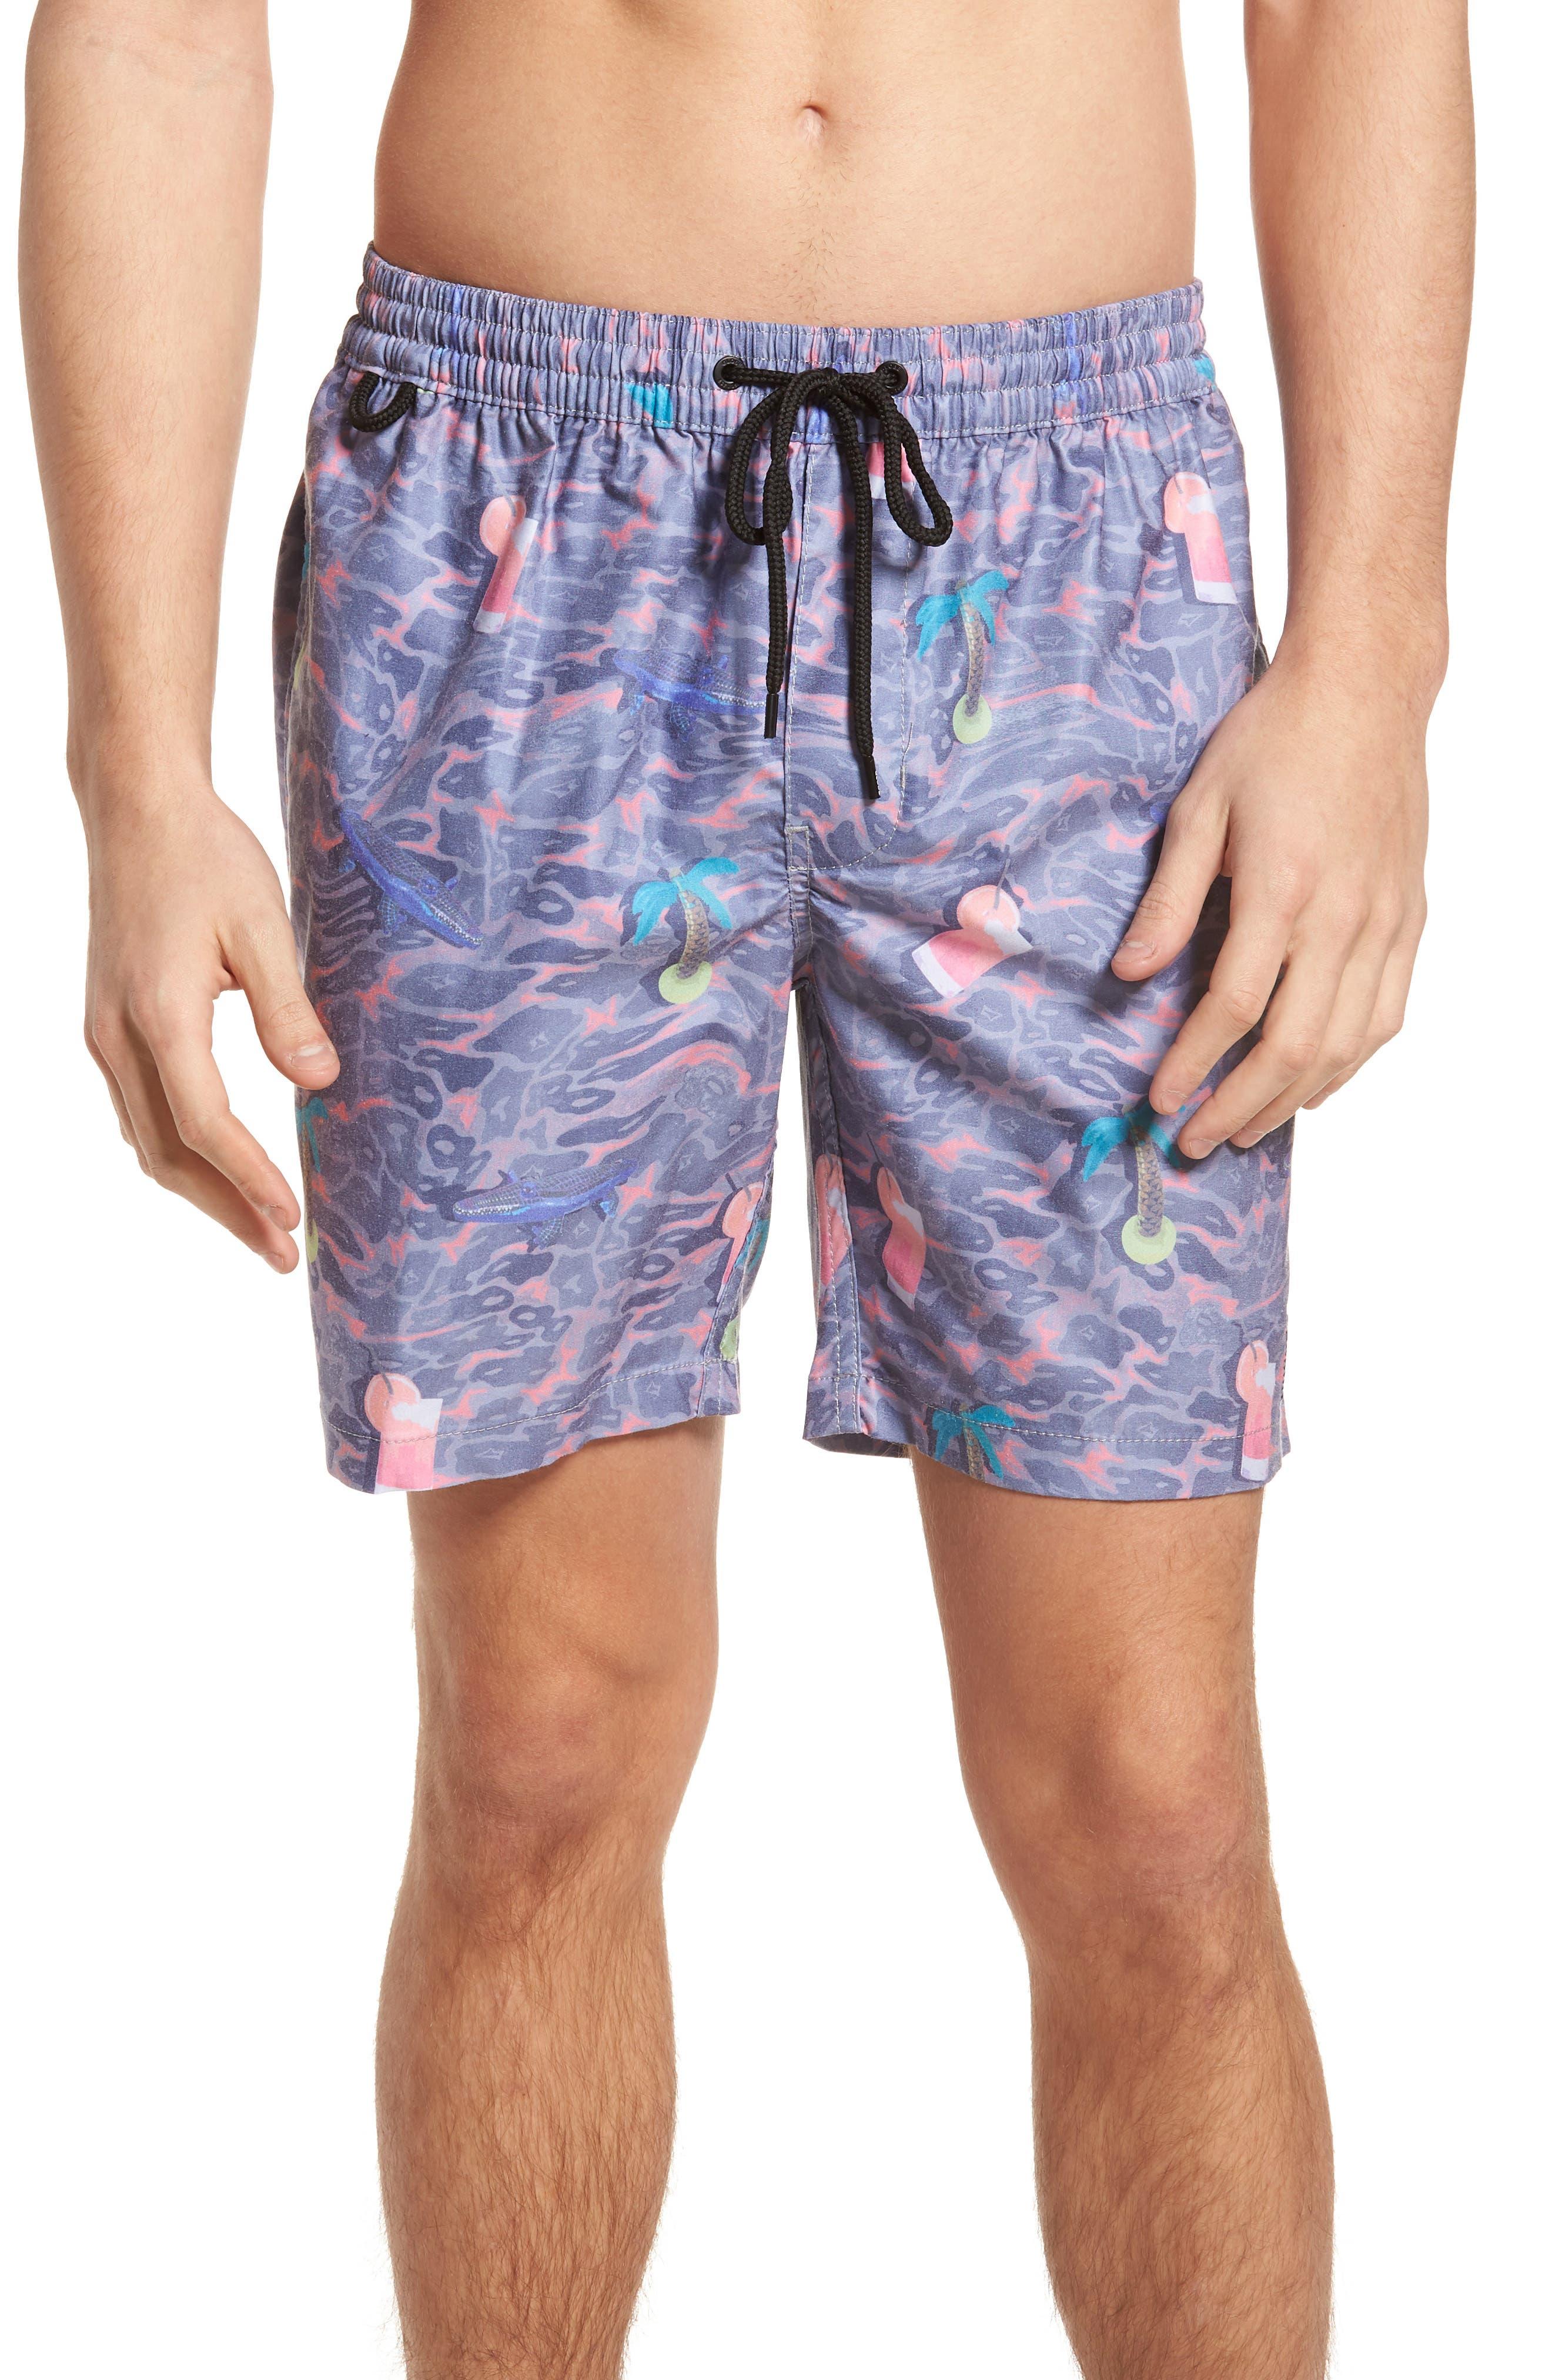 Deep End Pool Shorts,                             Main thumbnail 1, color,                             950